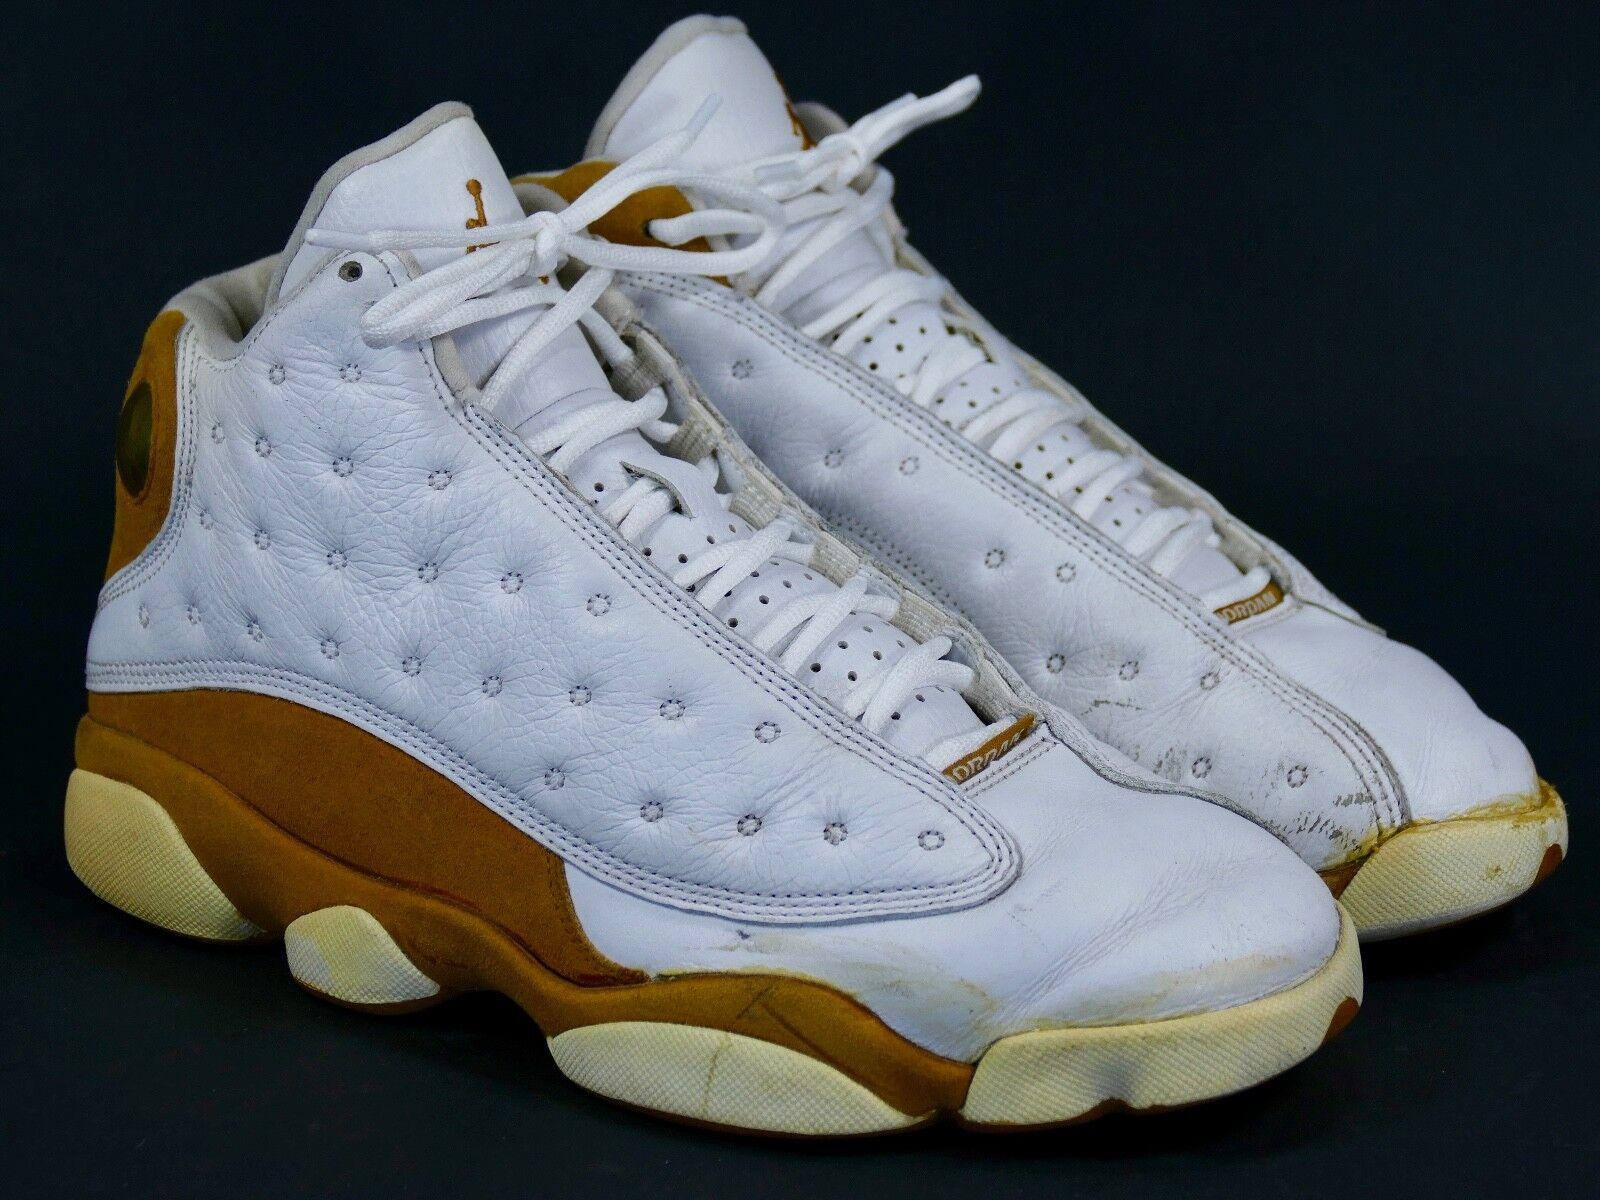 Jordan XIII Sz 8.5 Wheat - air retro 2004 13 curry ginger xi xii xiv 309259-171